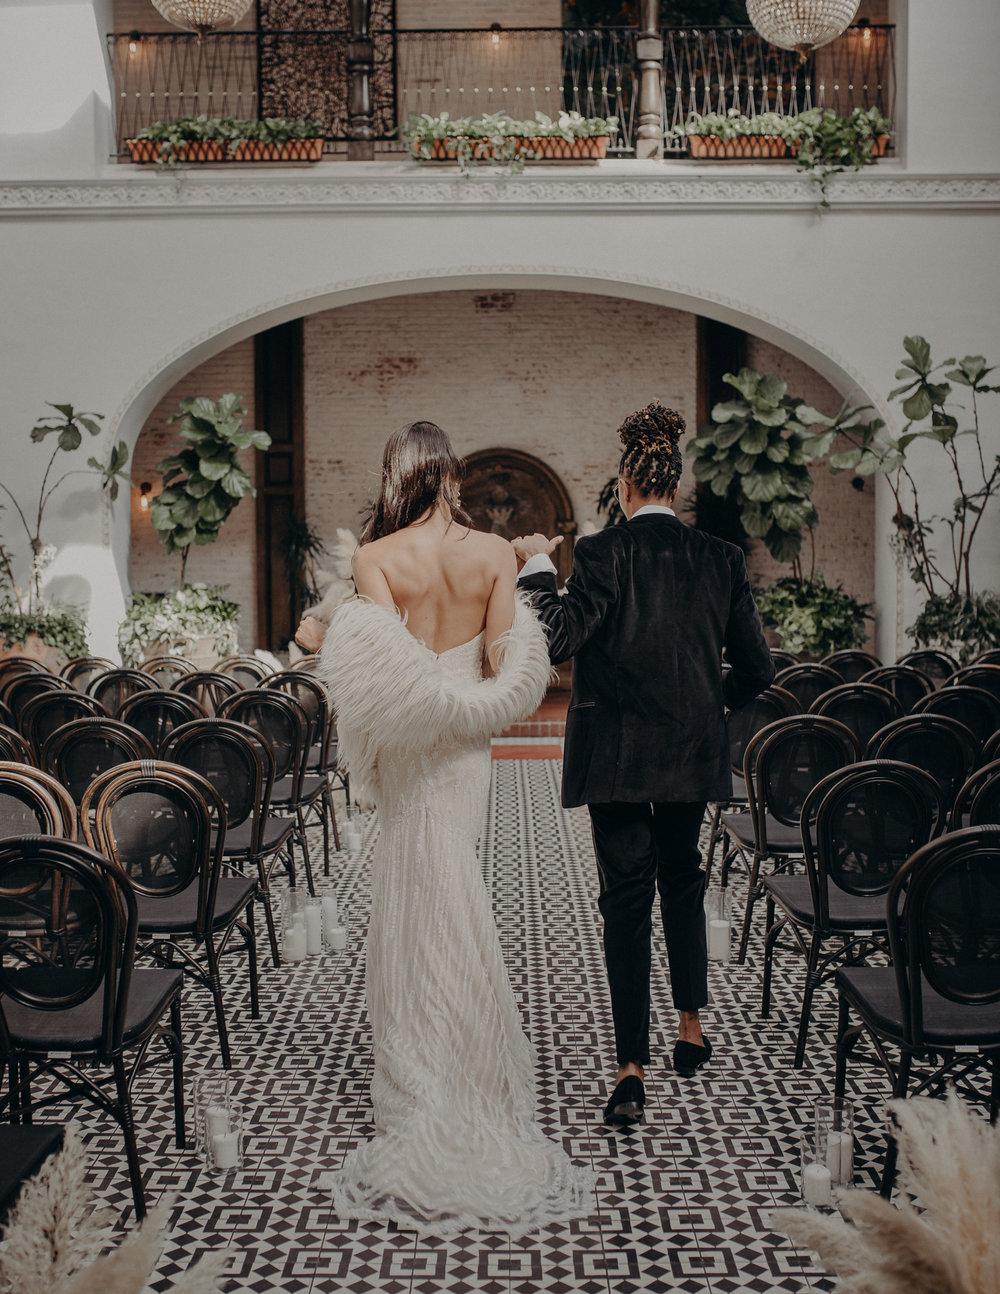 Wedding Photographer in Los Angeles - Ebell of Long Beach Wedding - LGBTQ weddings - lesbian wedding - IsaiahAndTaylor.com-061.jpg